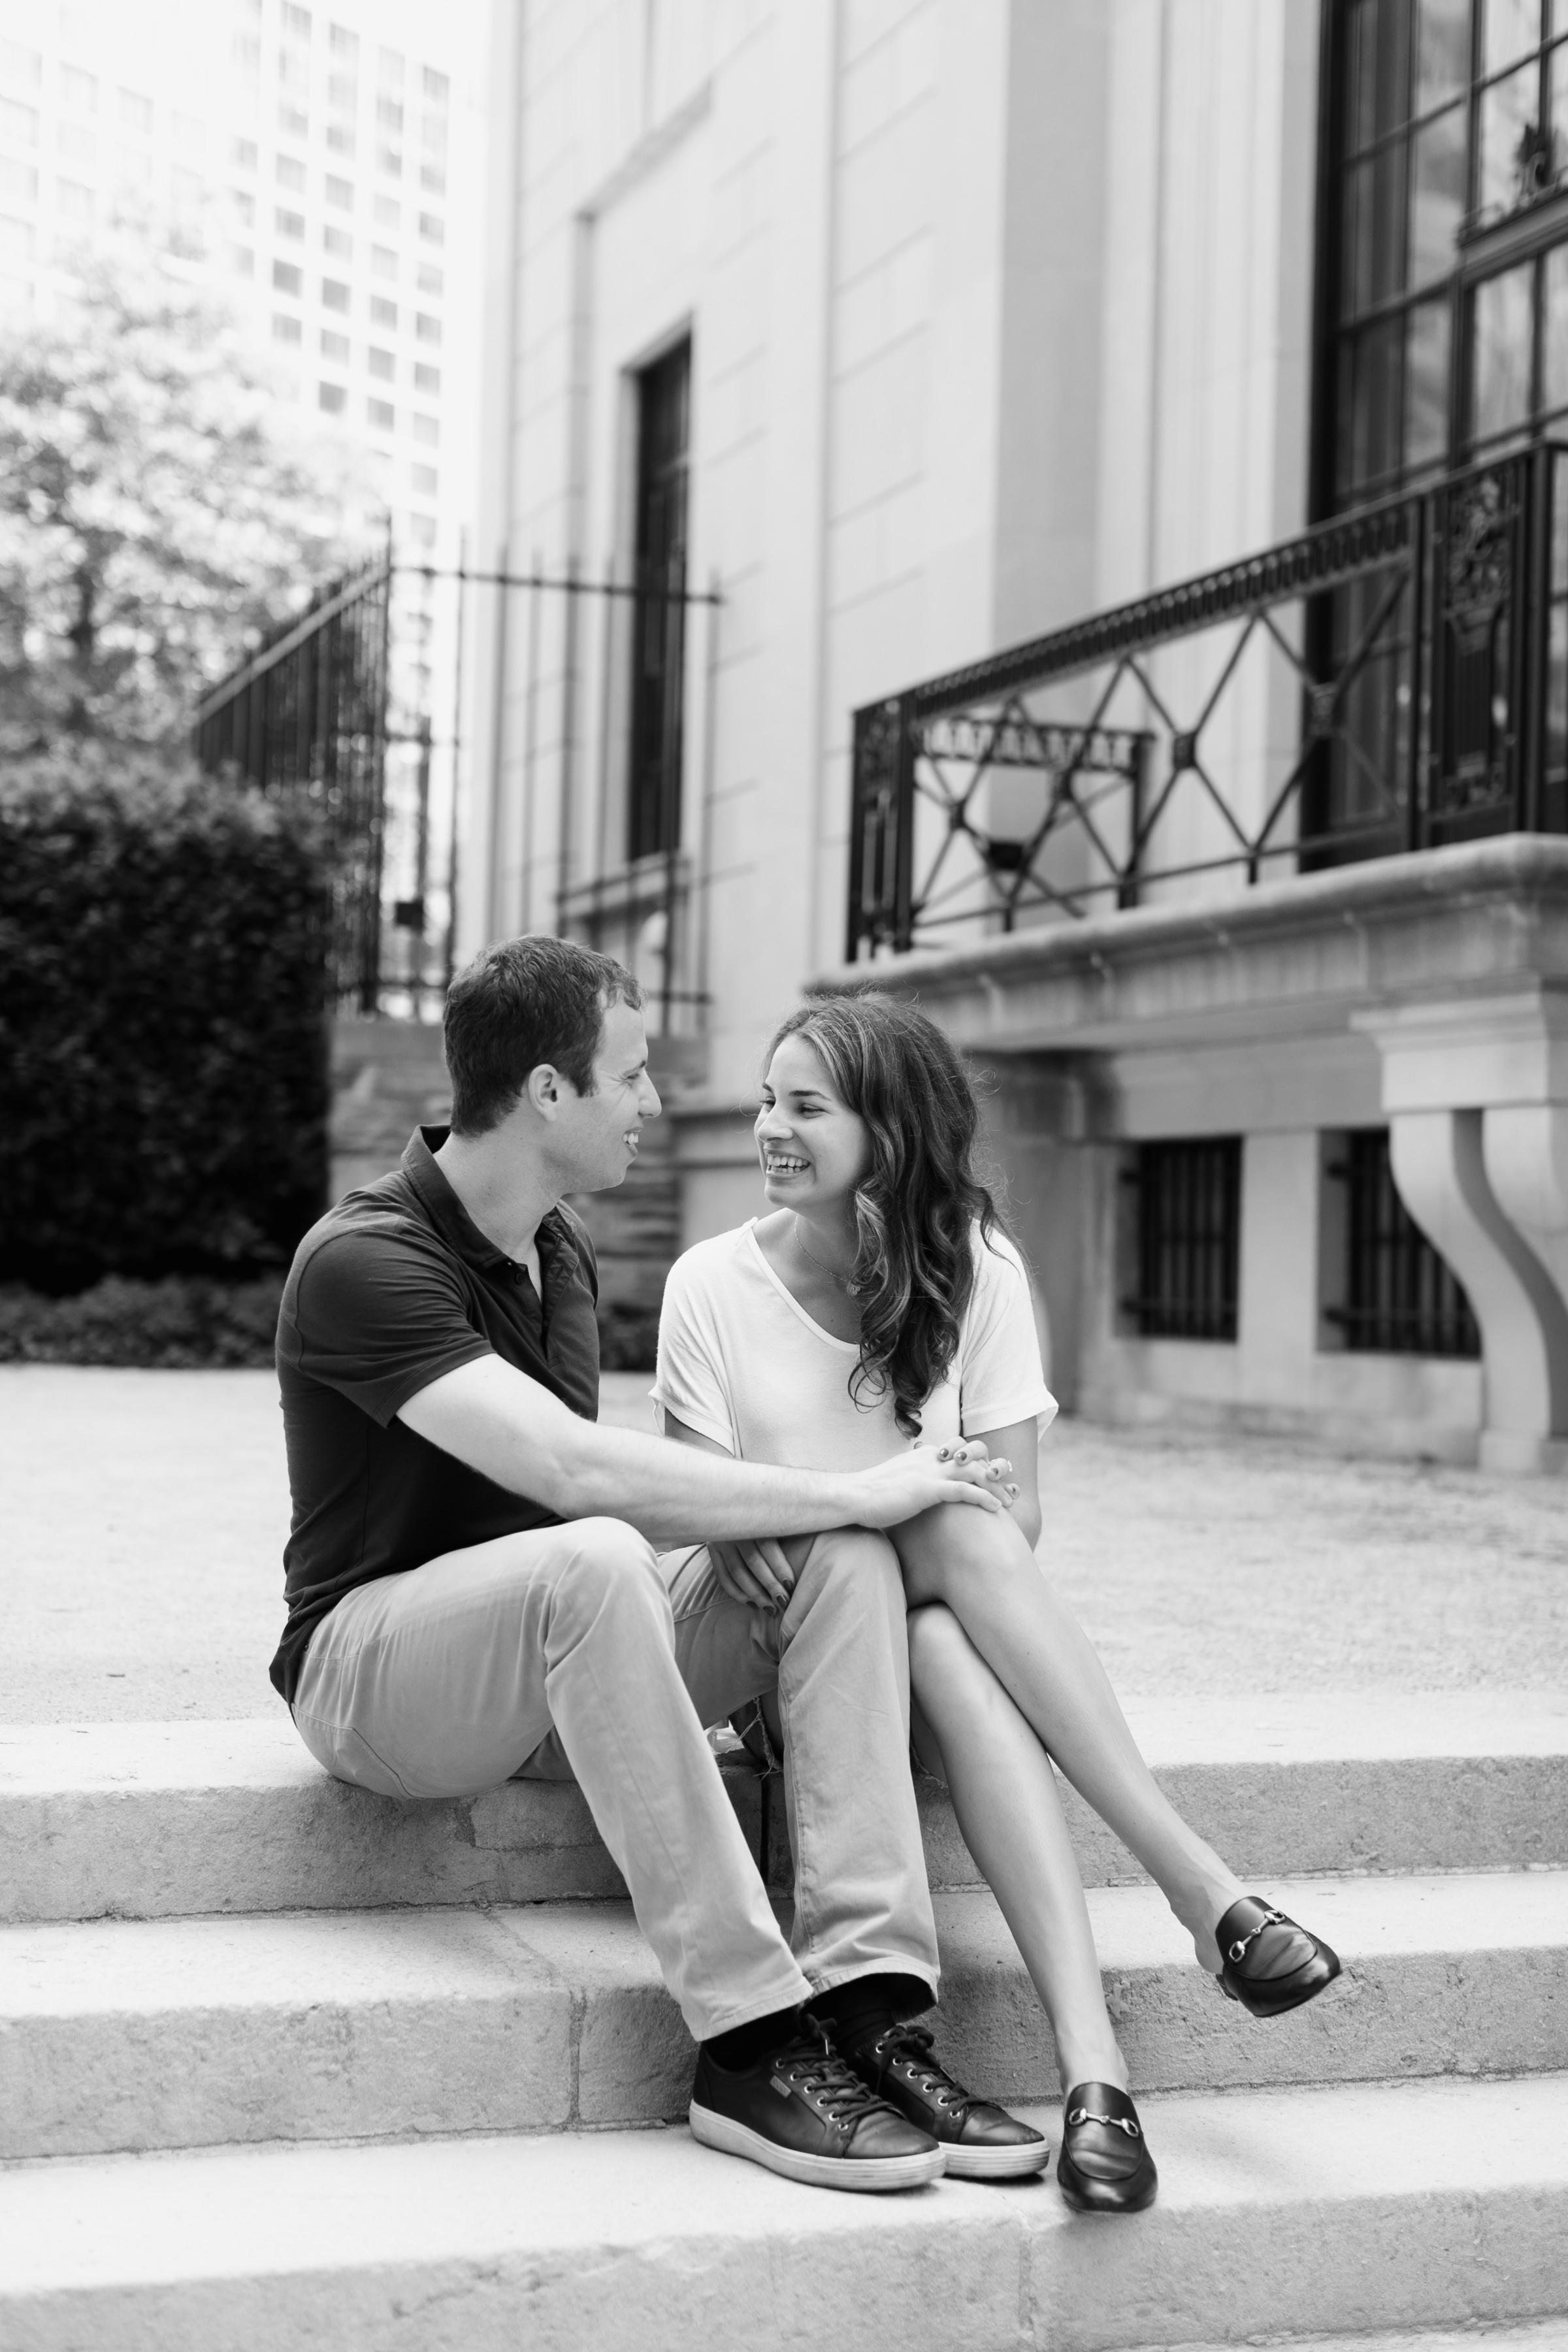 photography-natural-candid-engaged-proposal-philadelphia-wedding-rodin museum-barnes foundation-parkway-modern-lifestyle-13.JPG